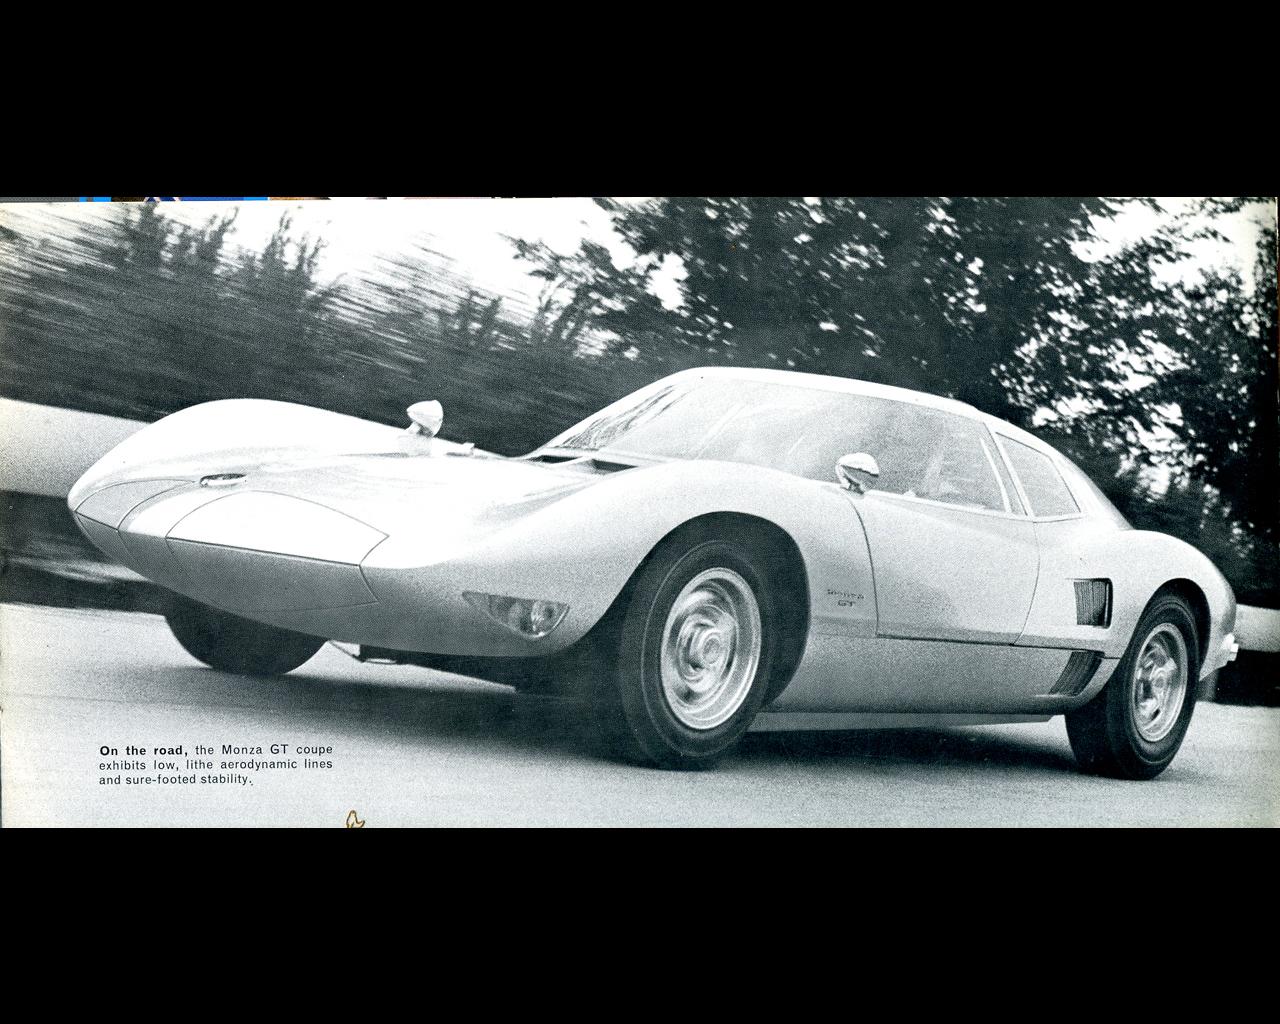 General Motors Chevrolet Experimental Corvair Monza Gt